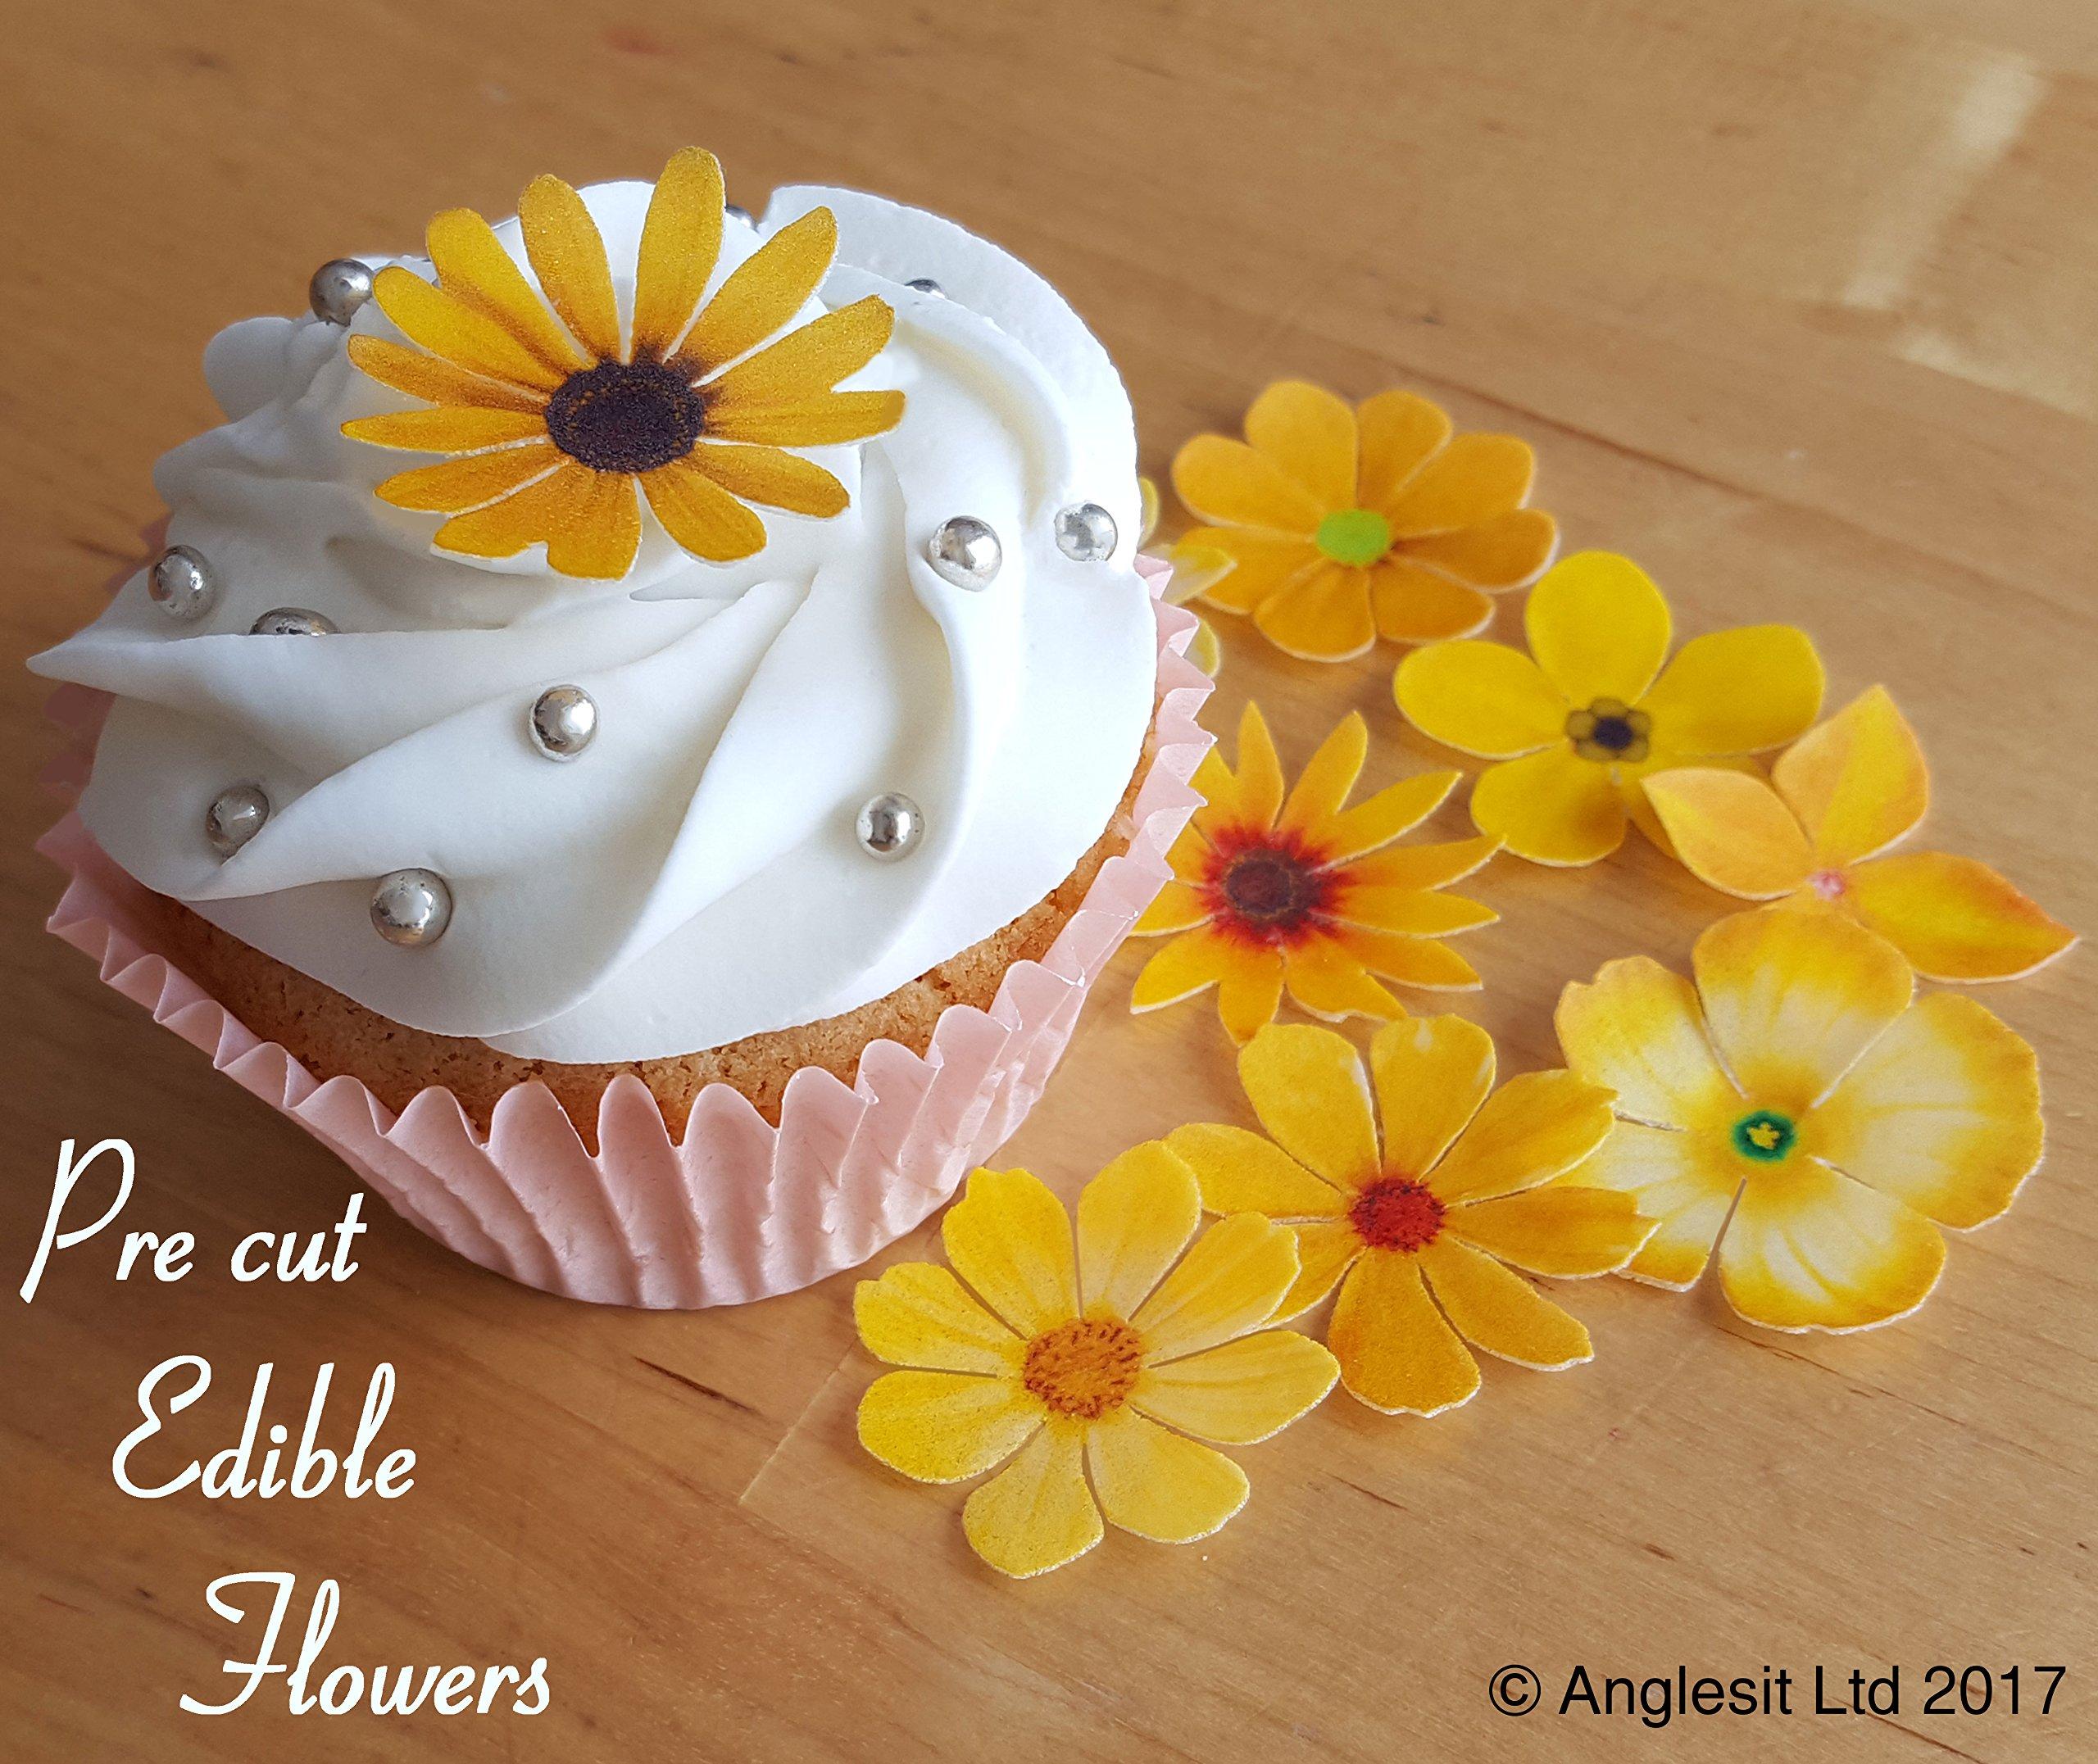 Edible Flower Cake Decorations Amazon